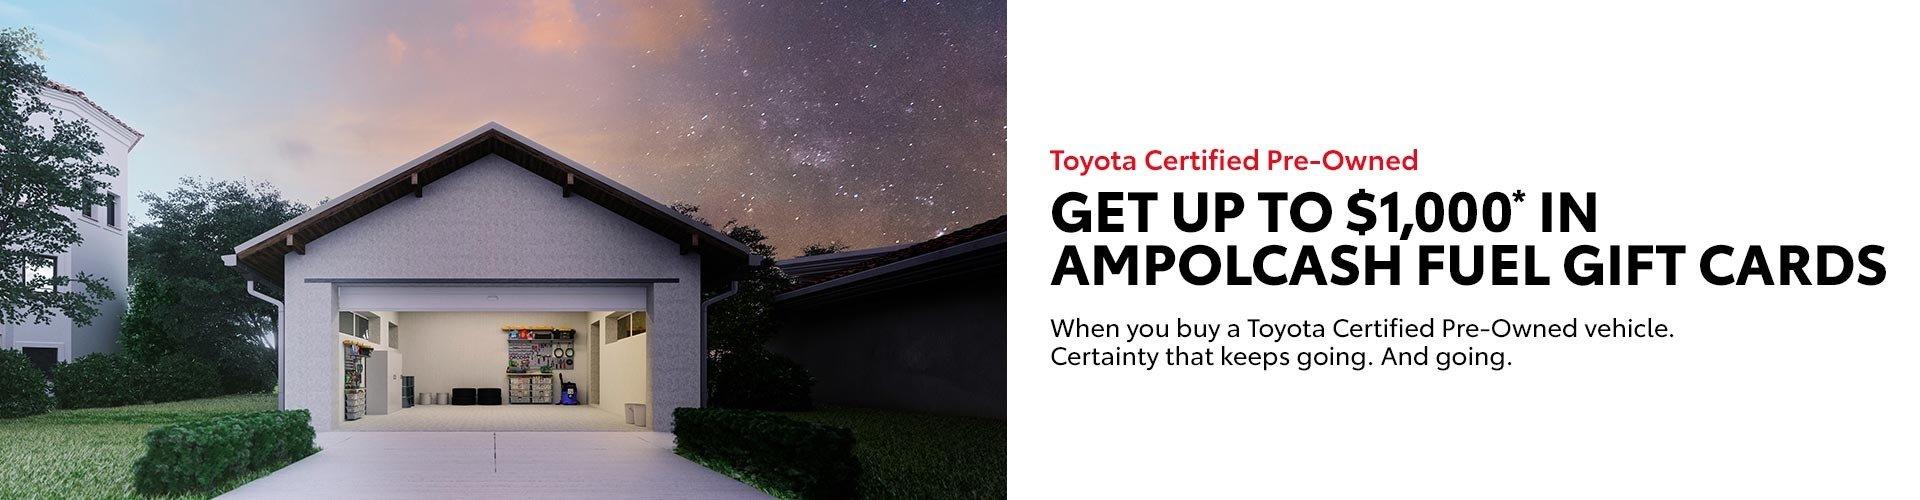 Werribee Toyota - TCPO Ampol Fuel Gift Cards